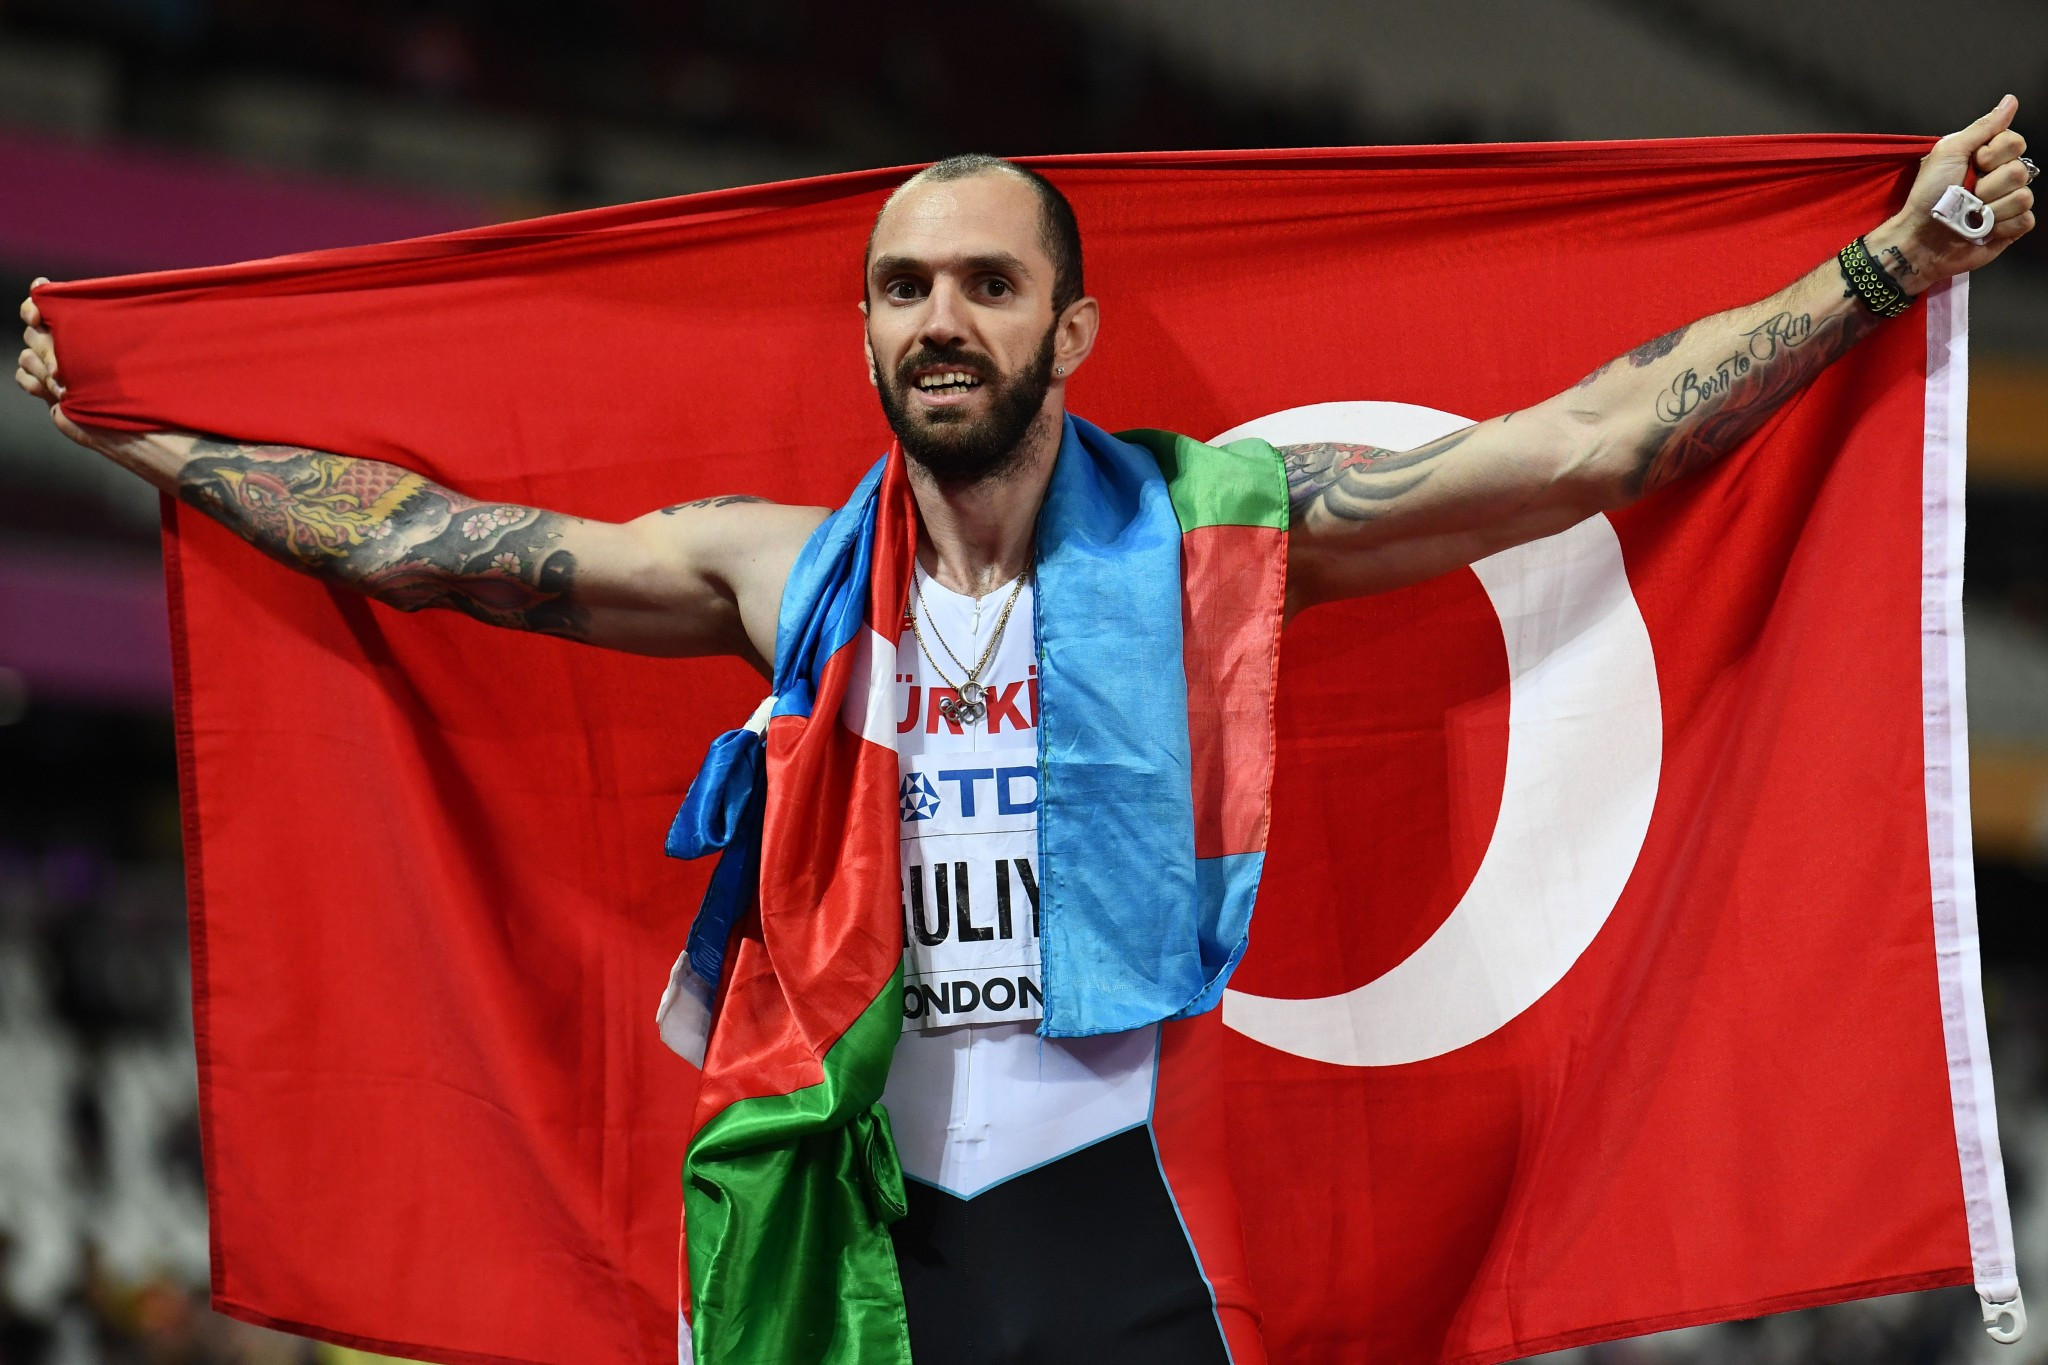 Guliyev stuns van Niekerk with shock 200m victory at IAAF World Championships